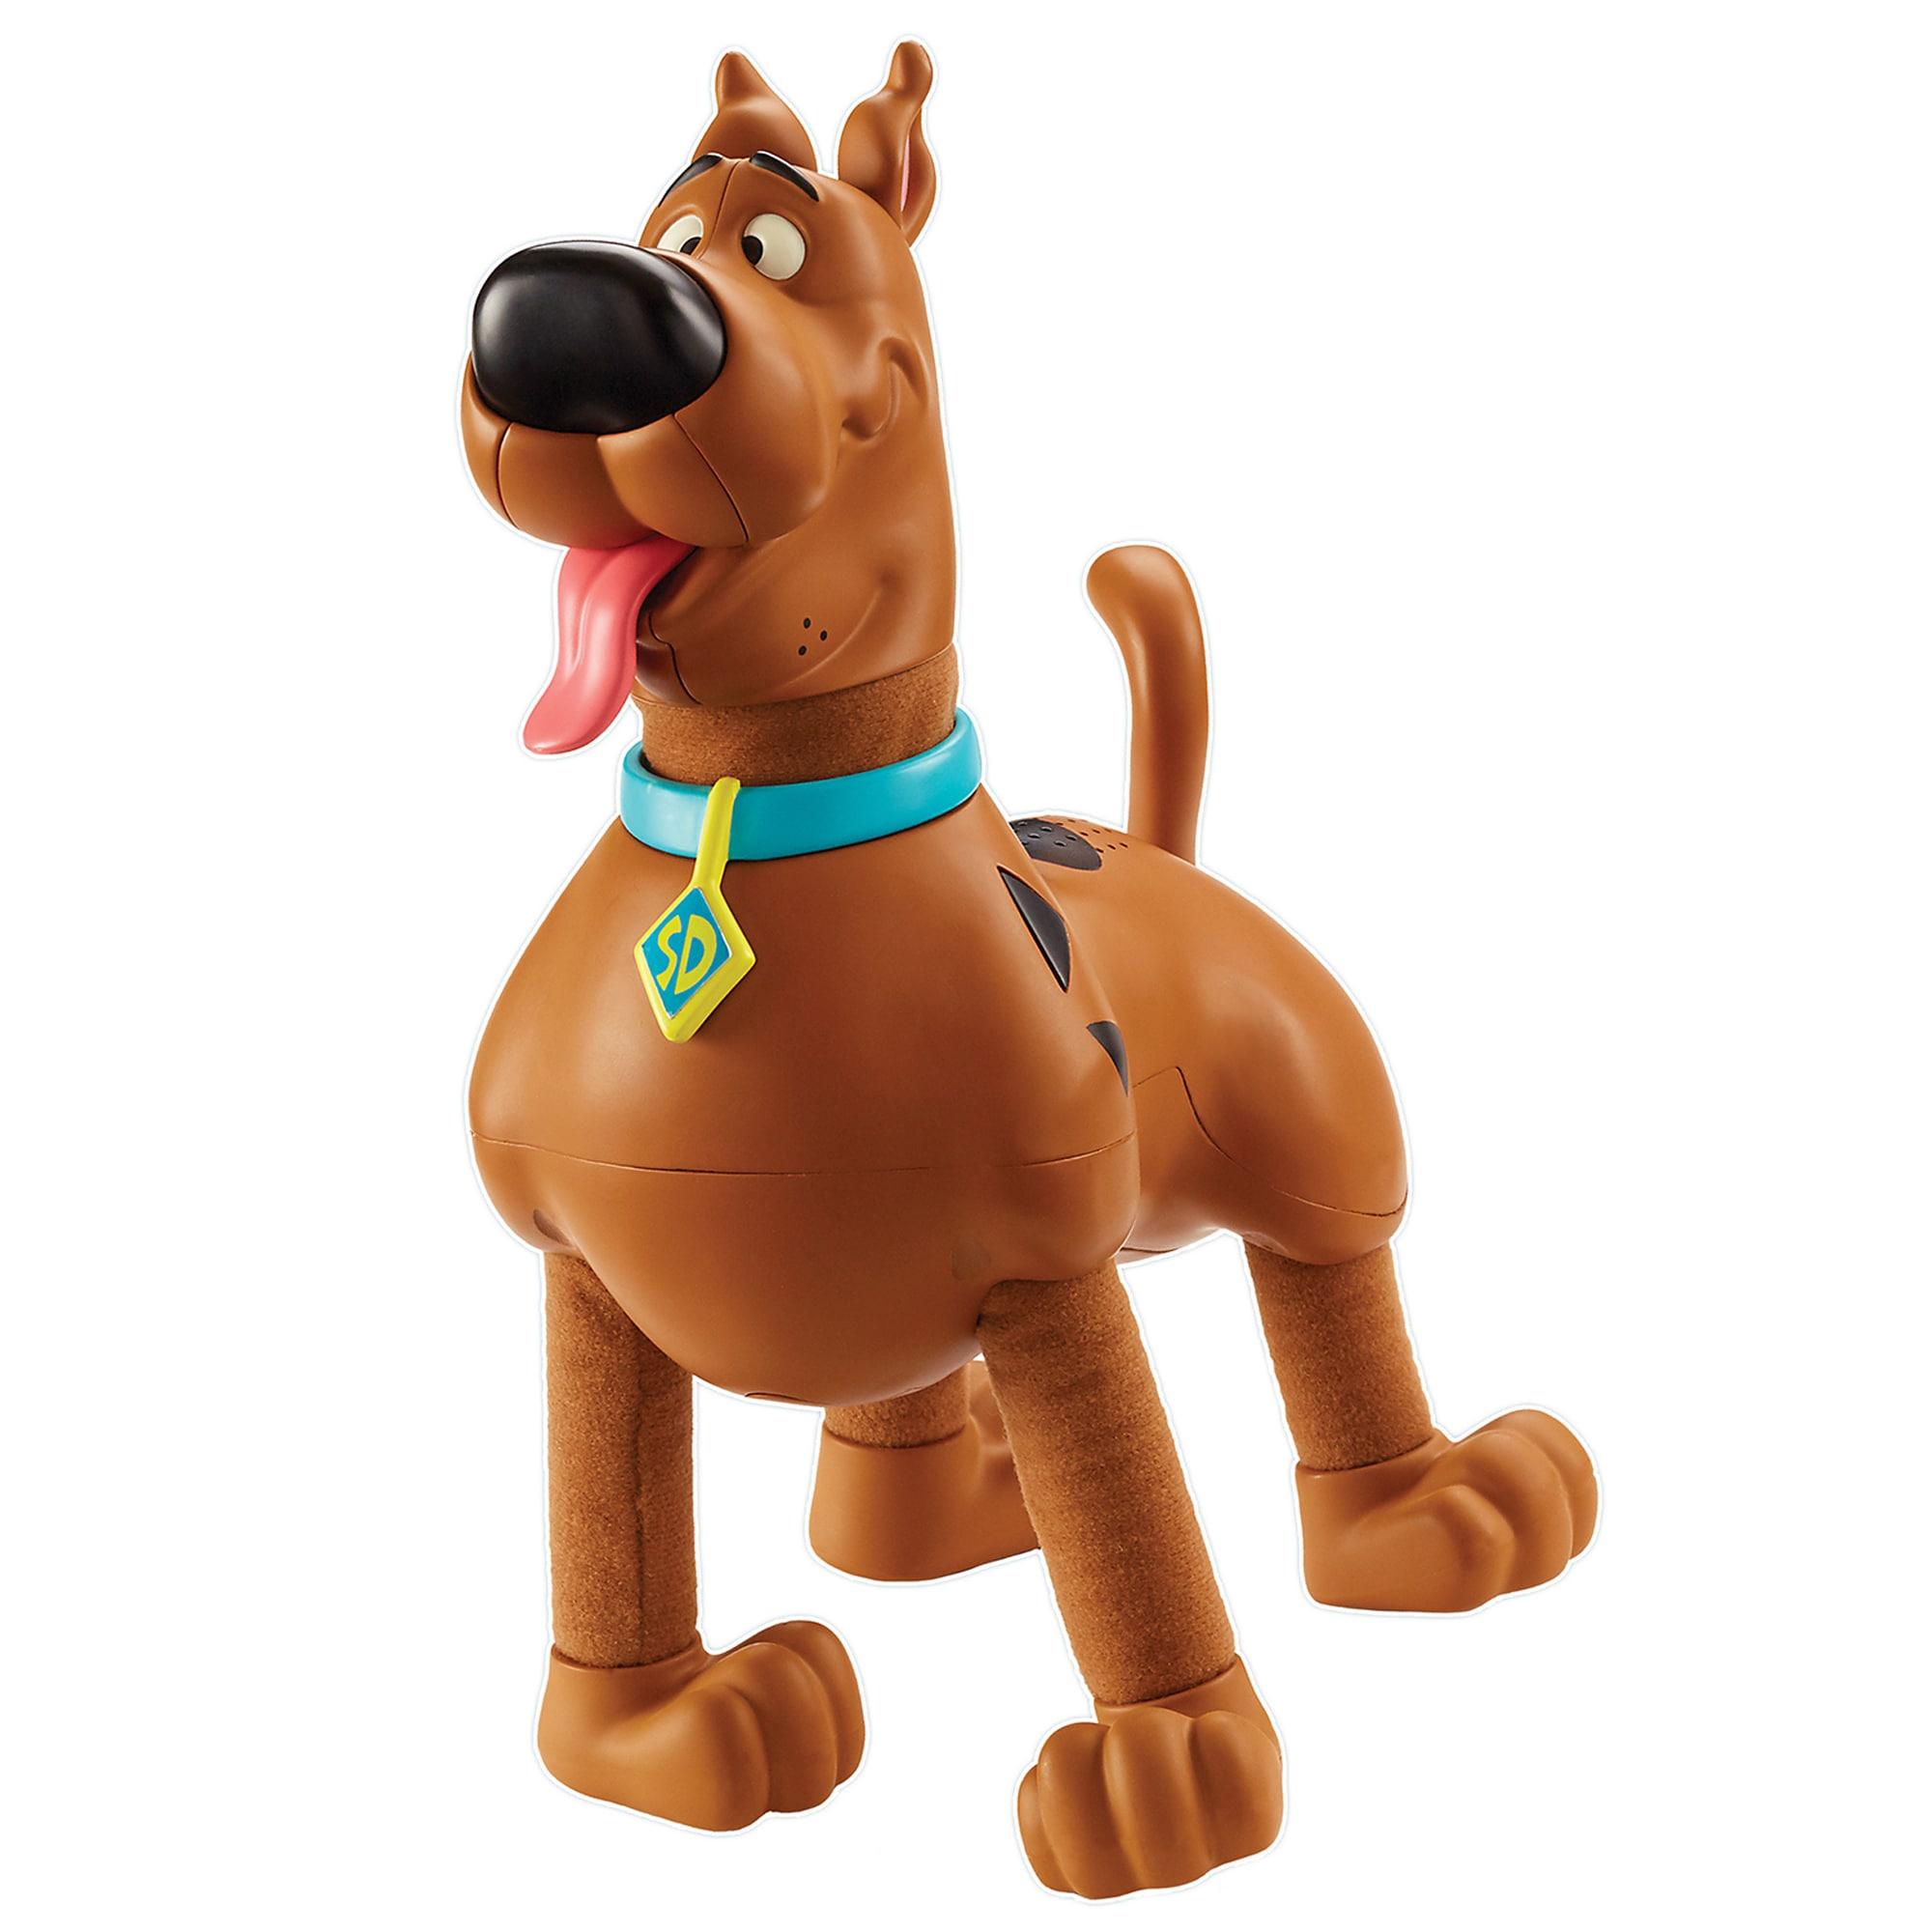 Scooby Doo Crazy Legs Scooby (Crazy Legs Scooby)